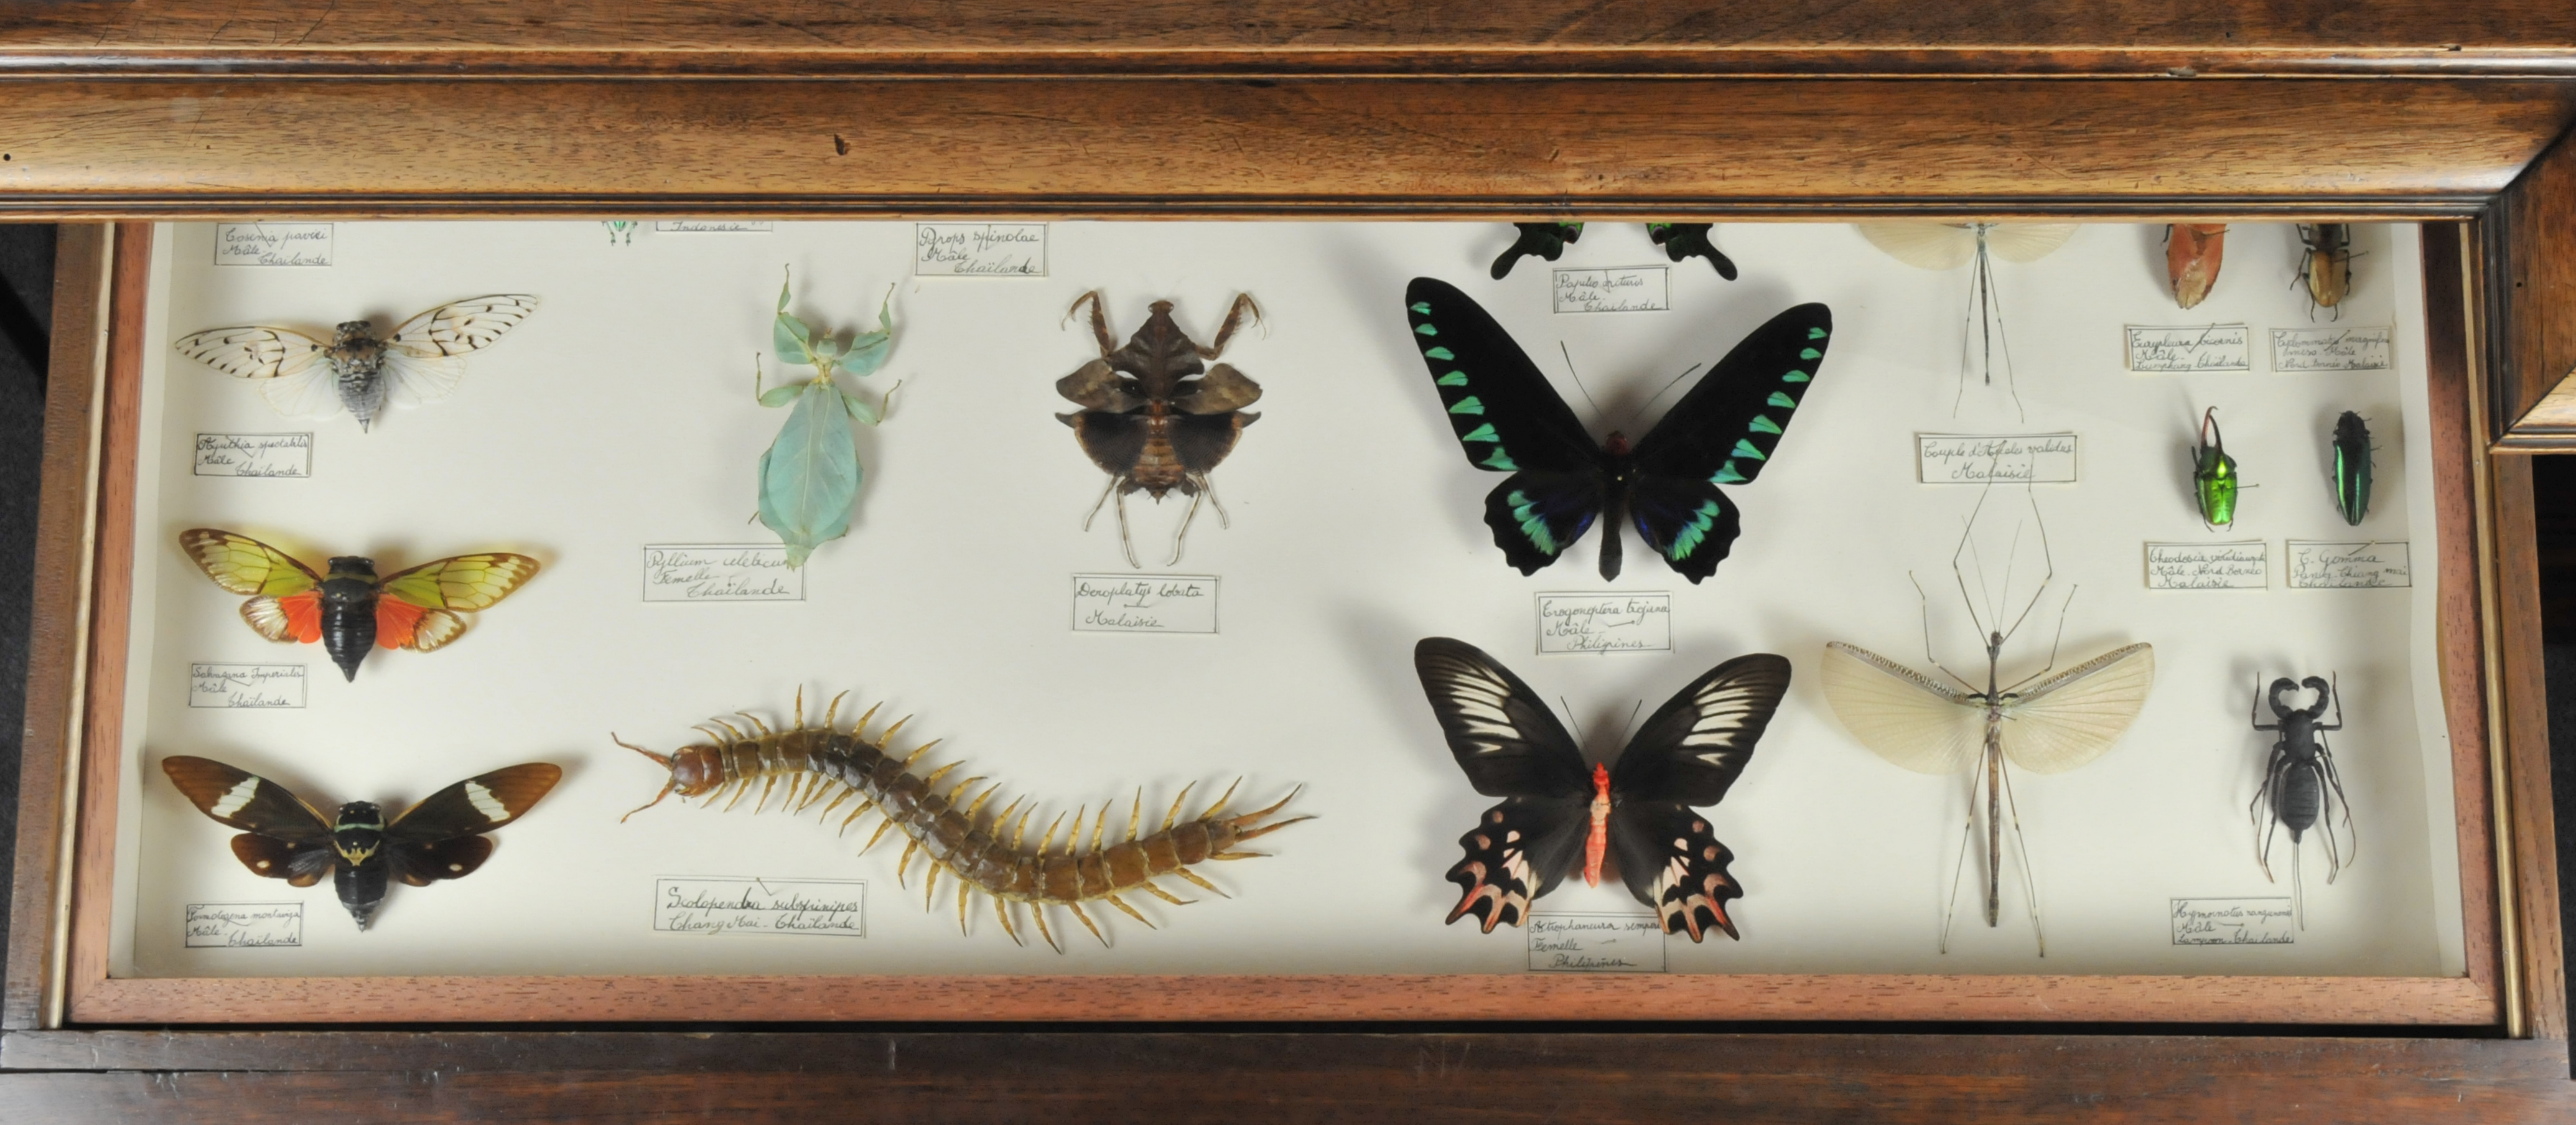 Insectes du Cabinet de curiosités